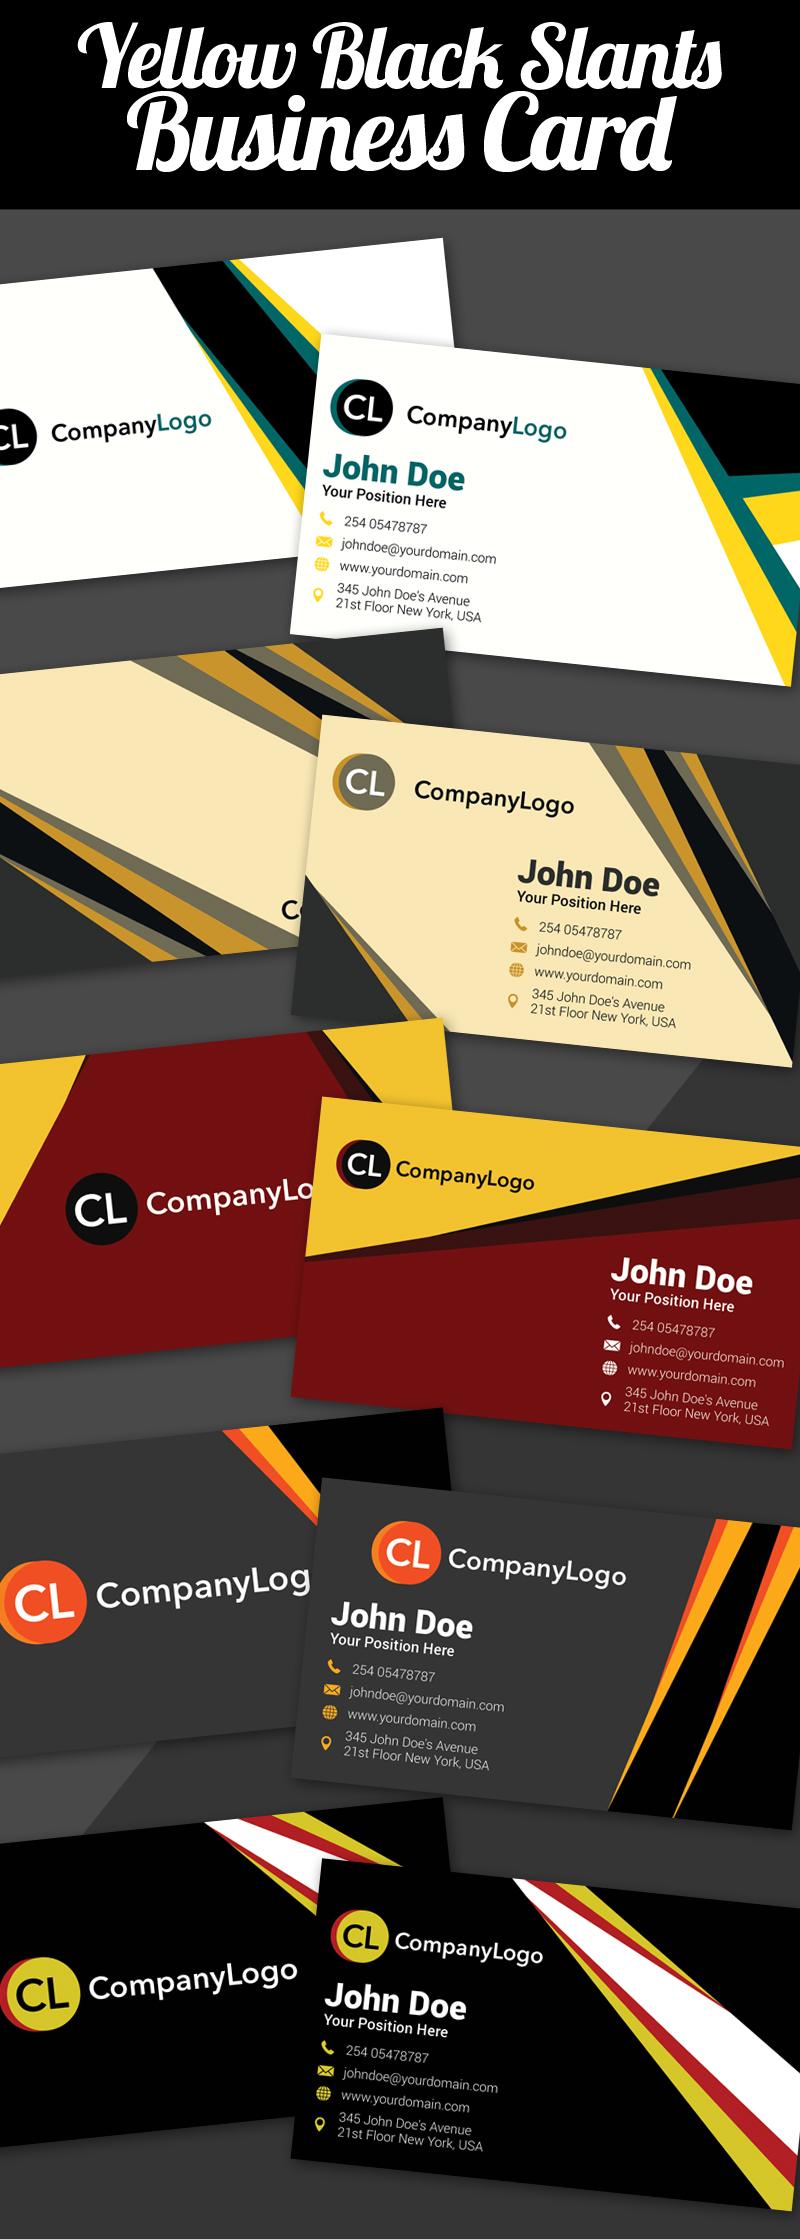 Yellow Black Slants Business Cards